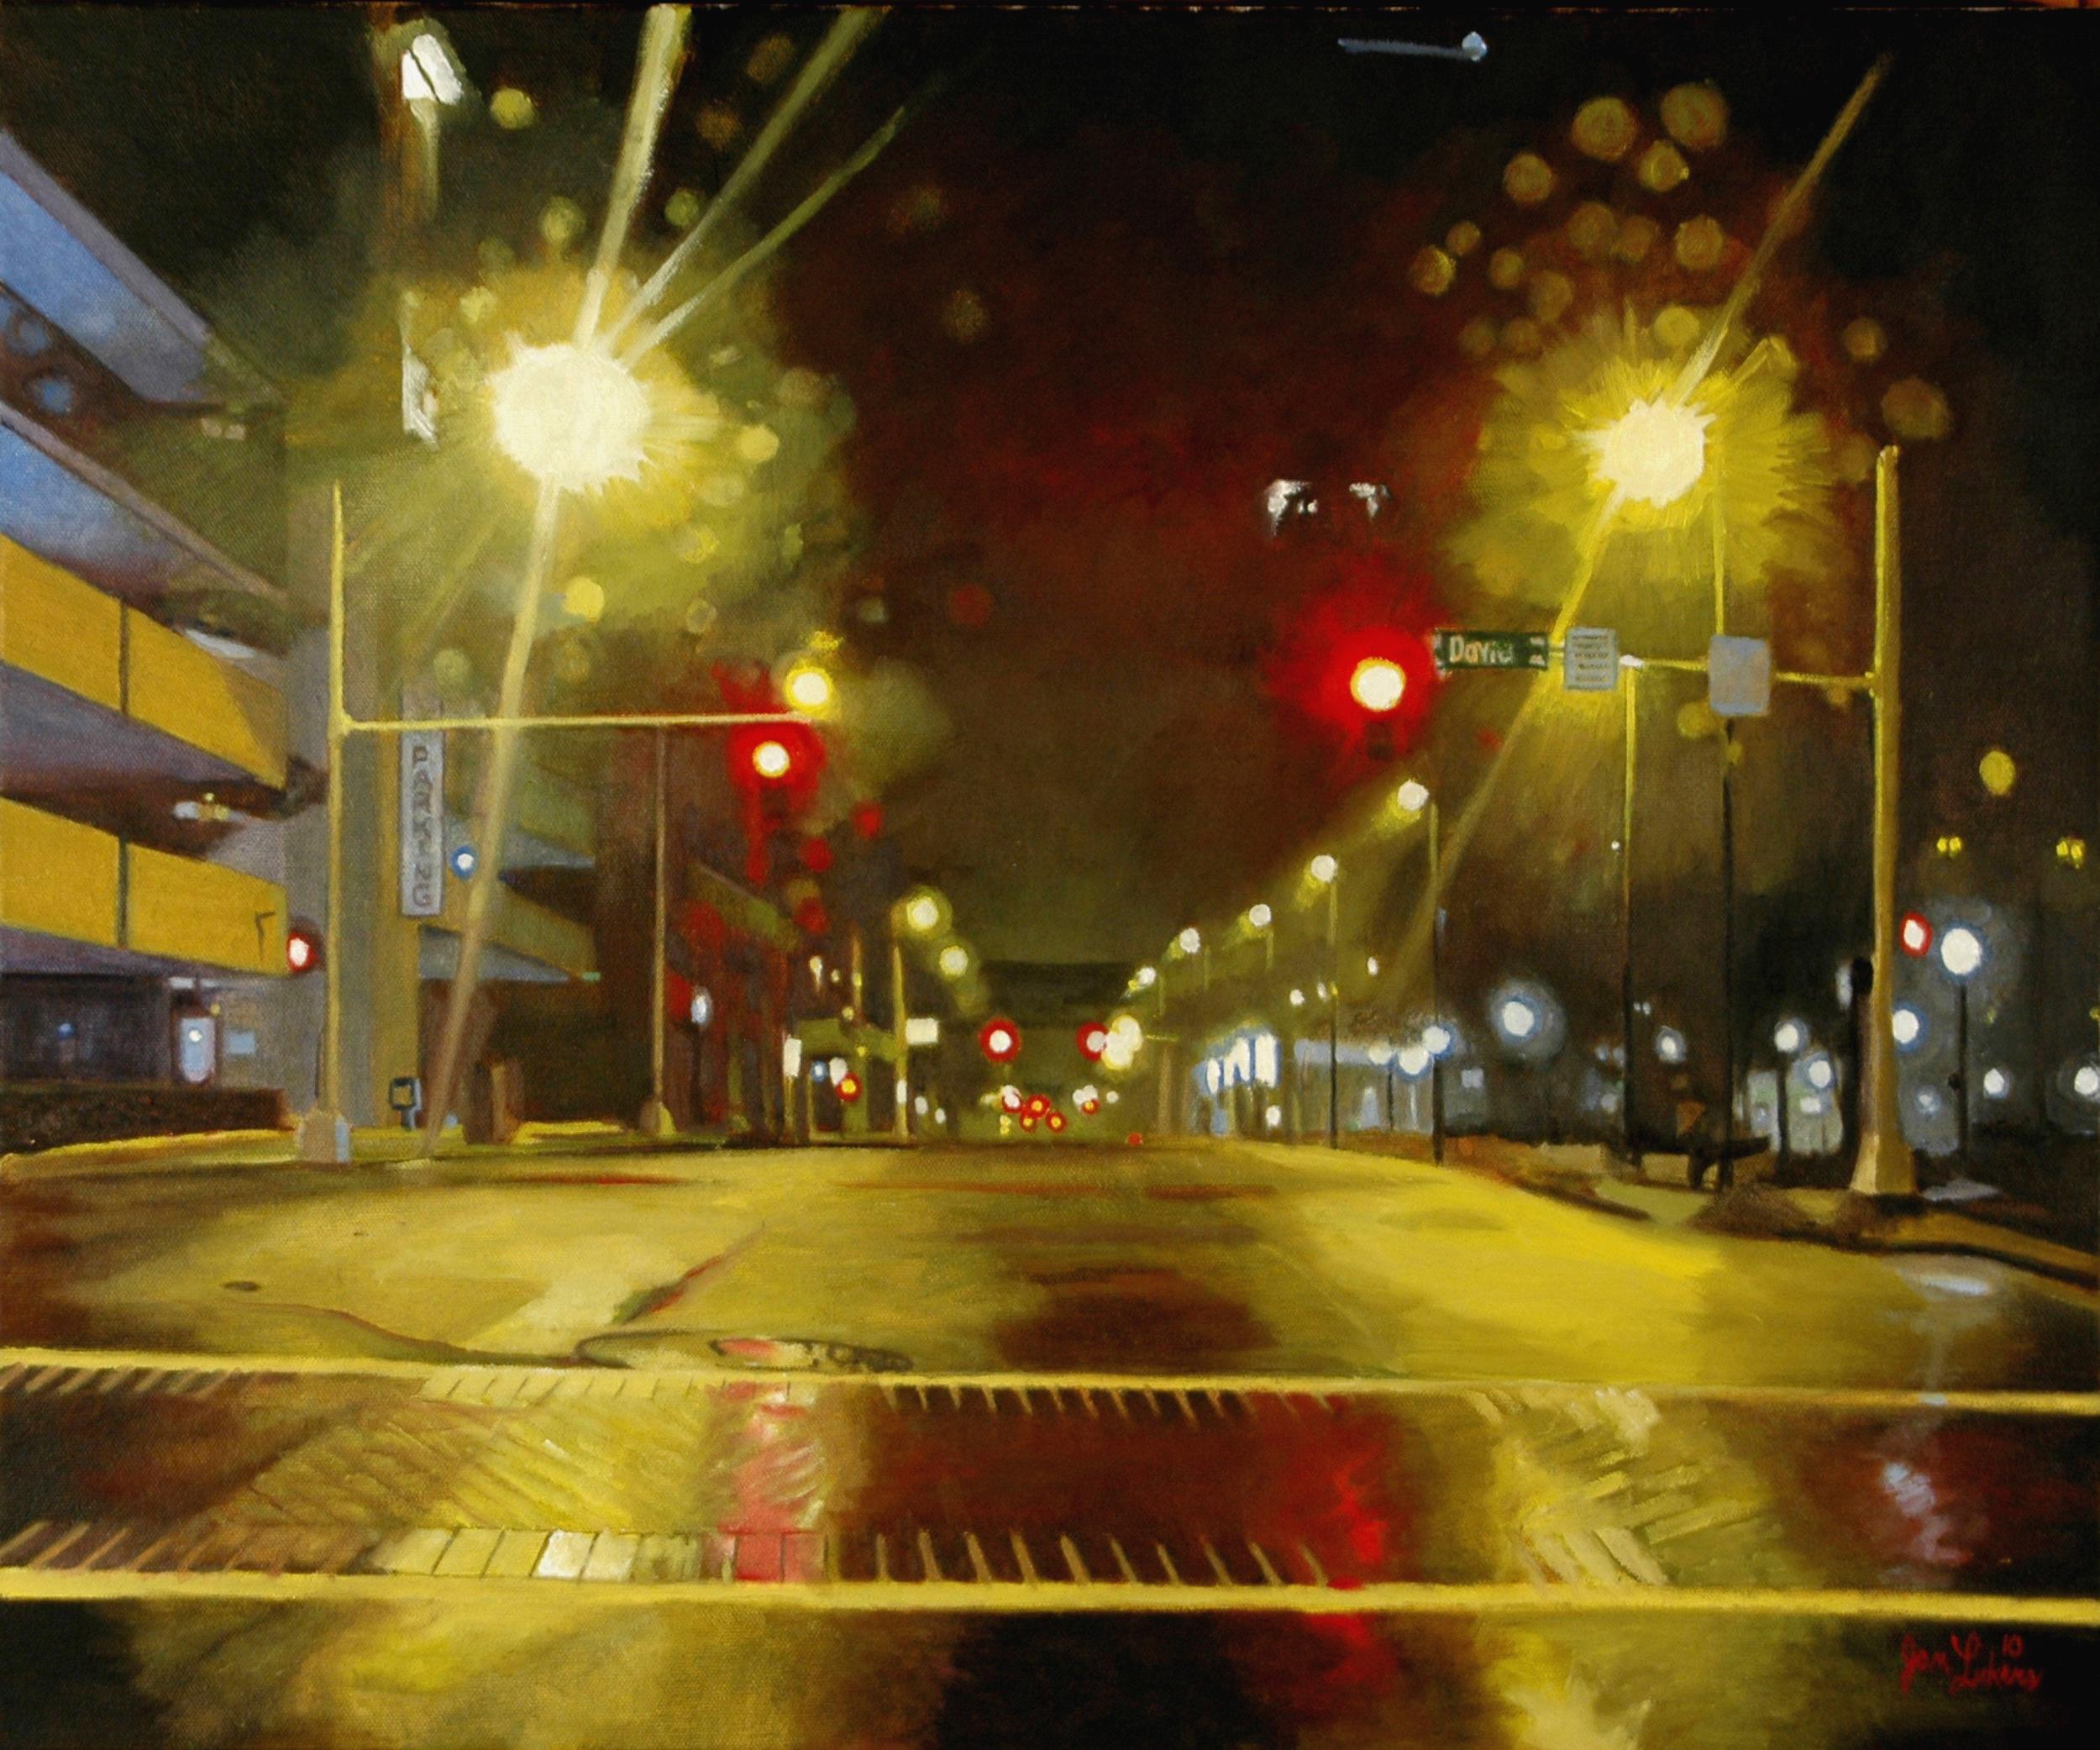 Wet Street at Night